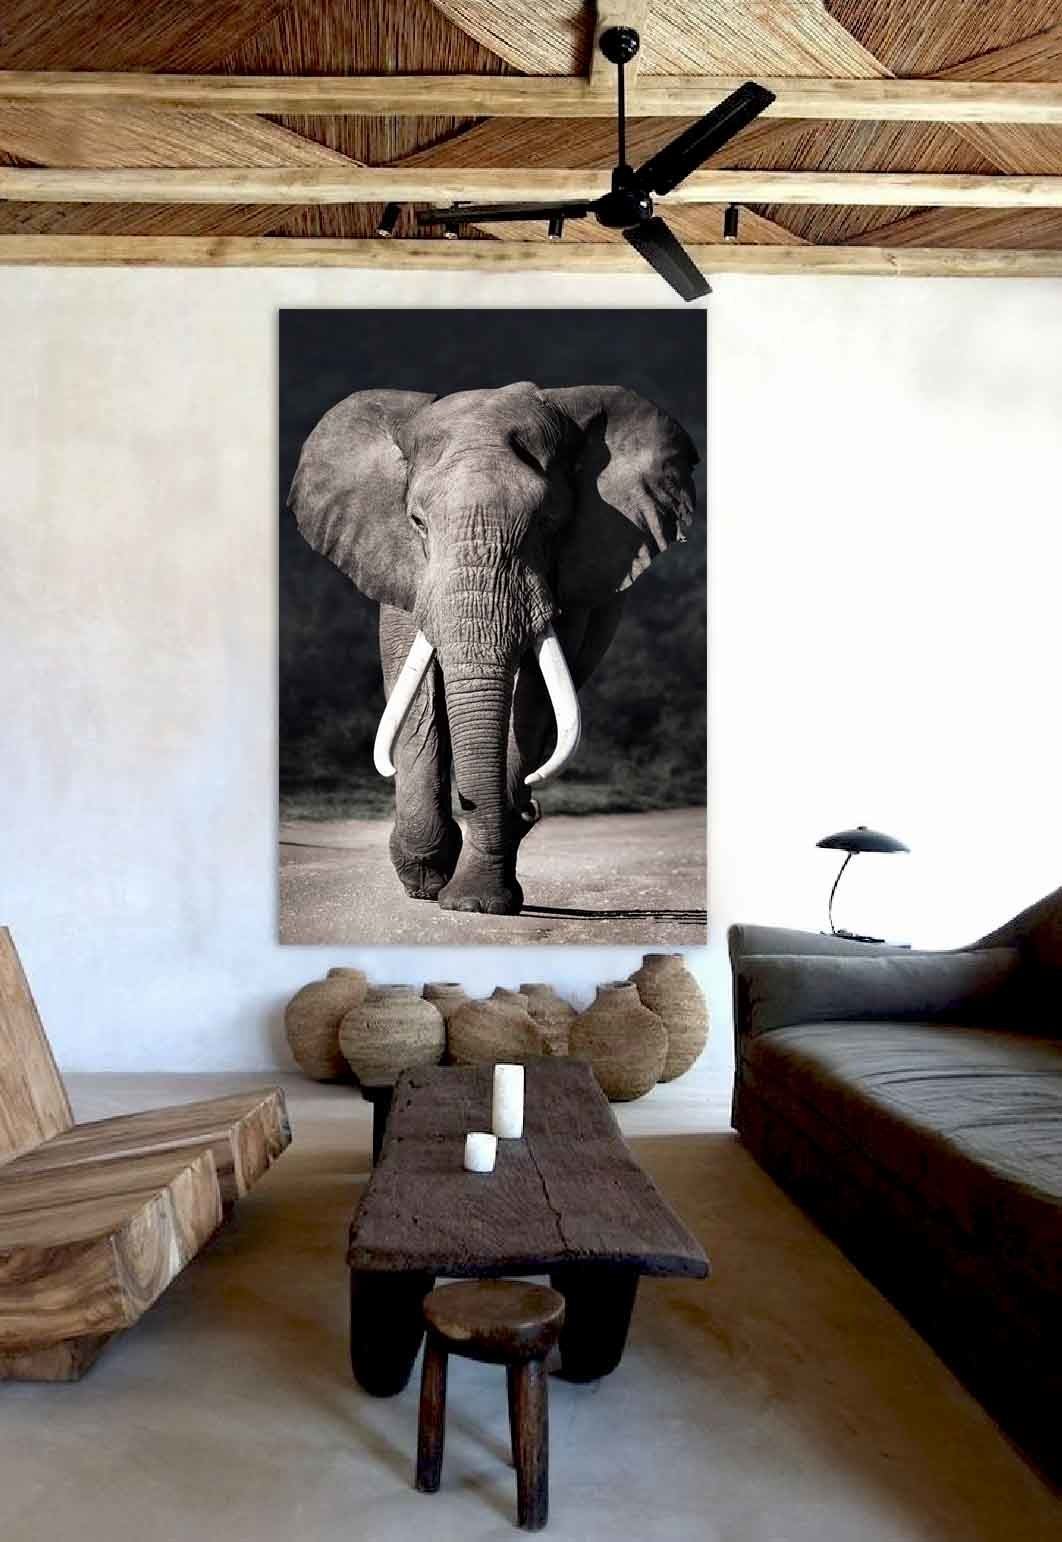 Elephant approaching-2